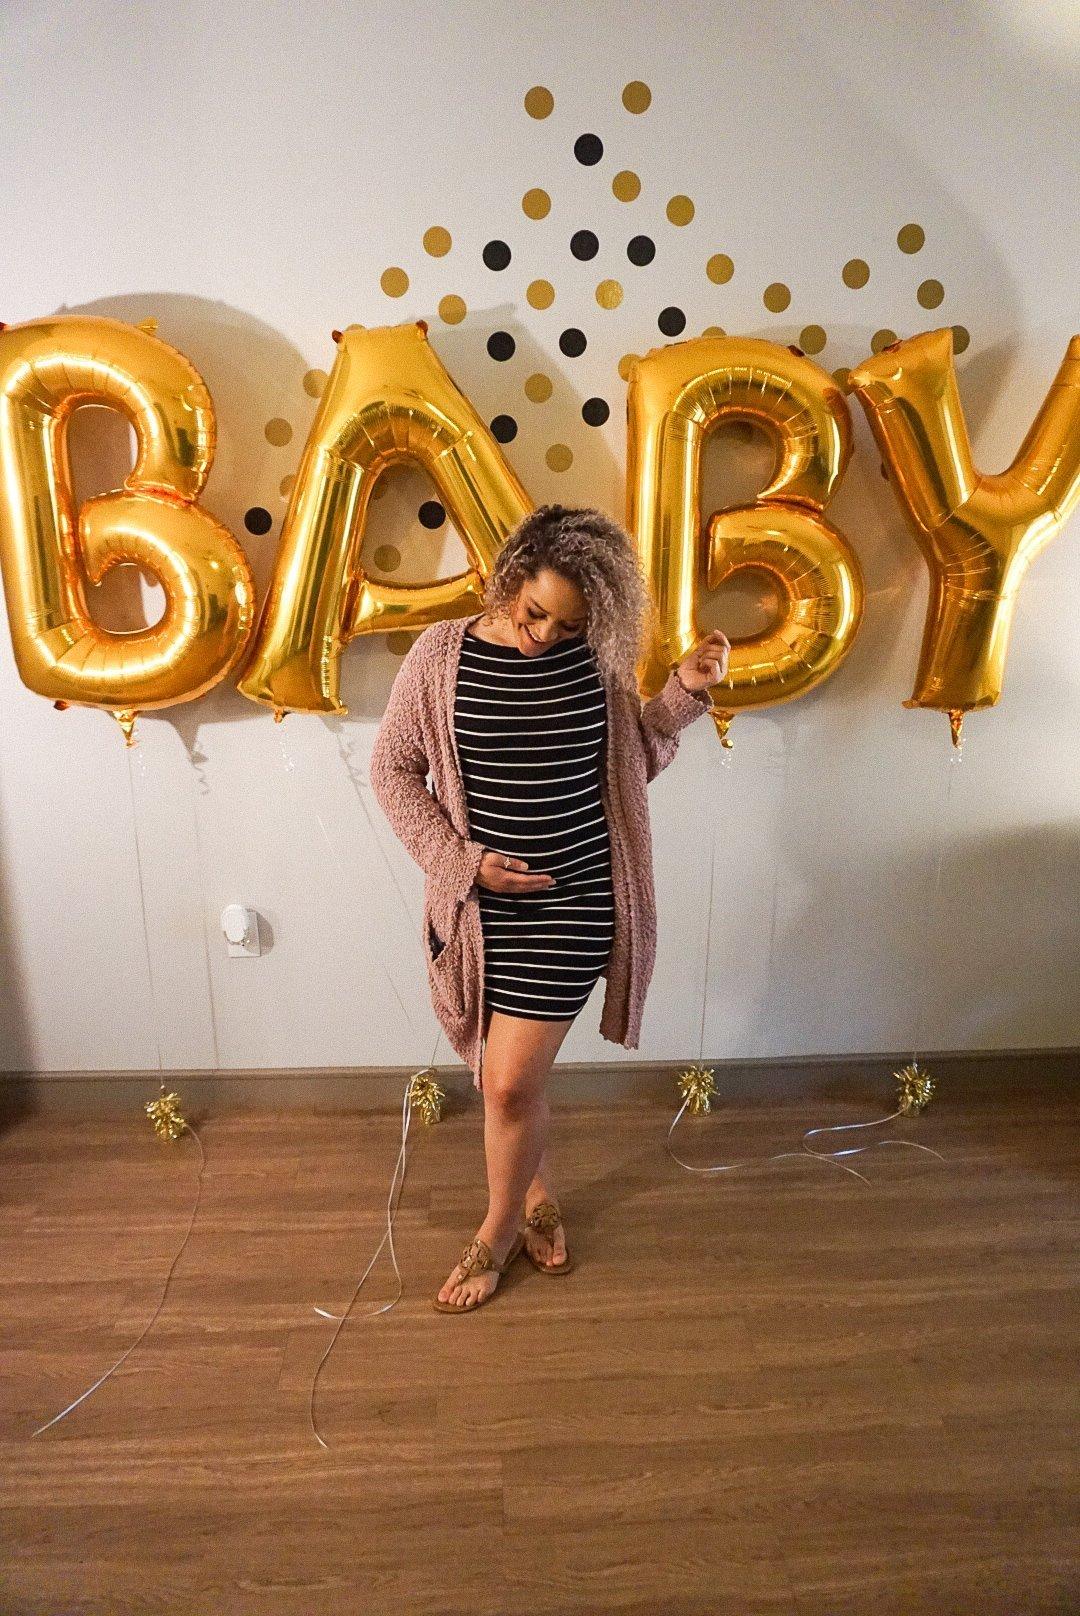 Welcoming Baby Bean!